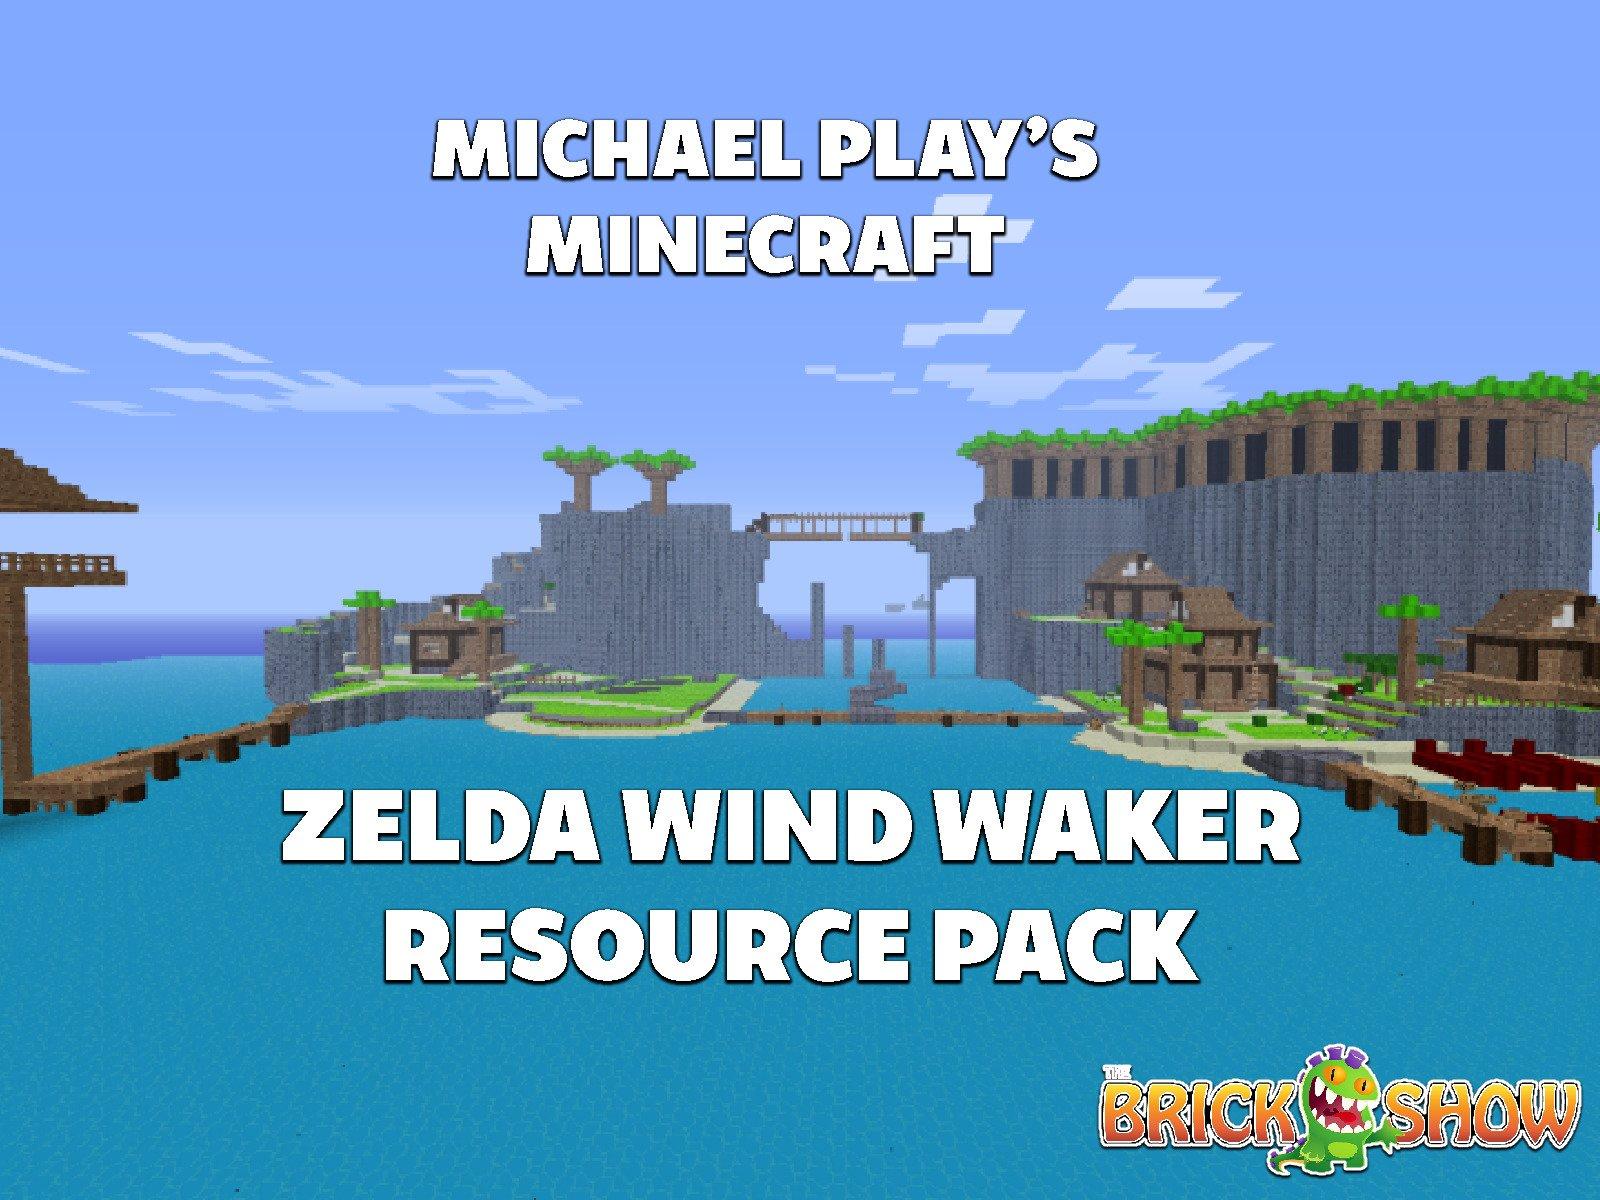 Clip: Michael Play's Minecraft Zelda Wind Waker Resource Pack